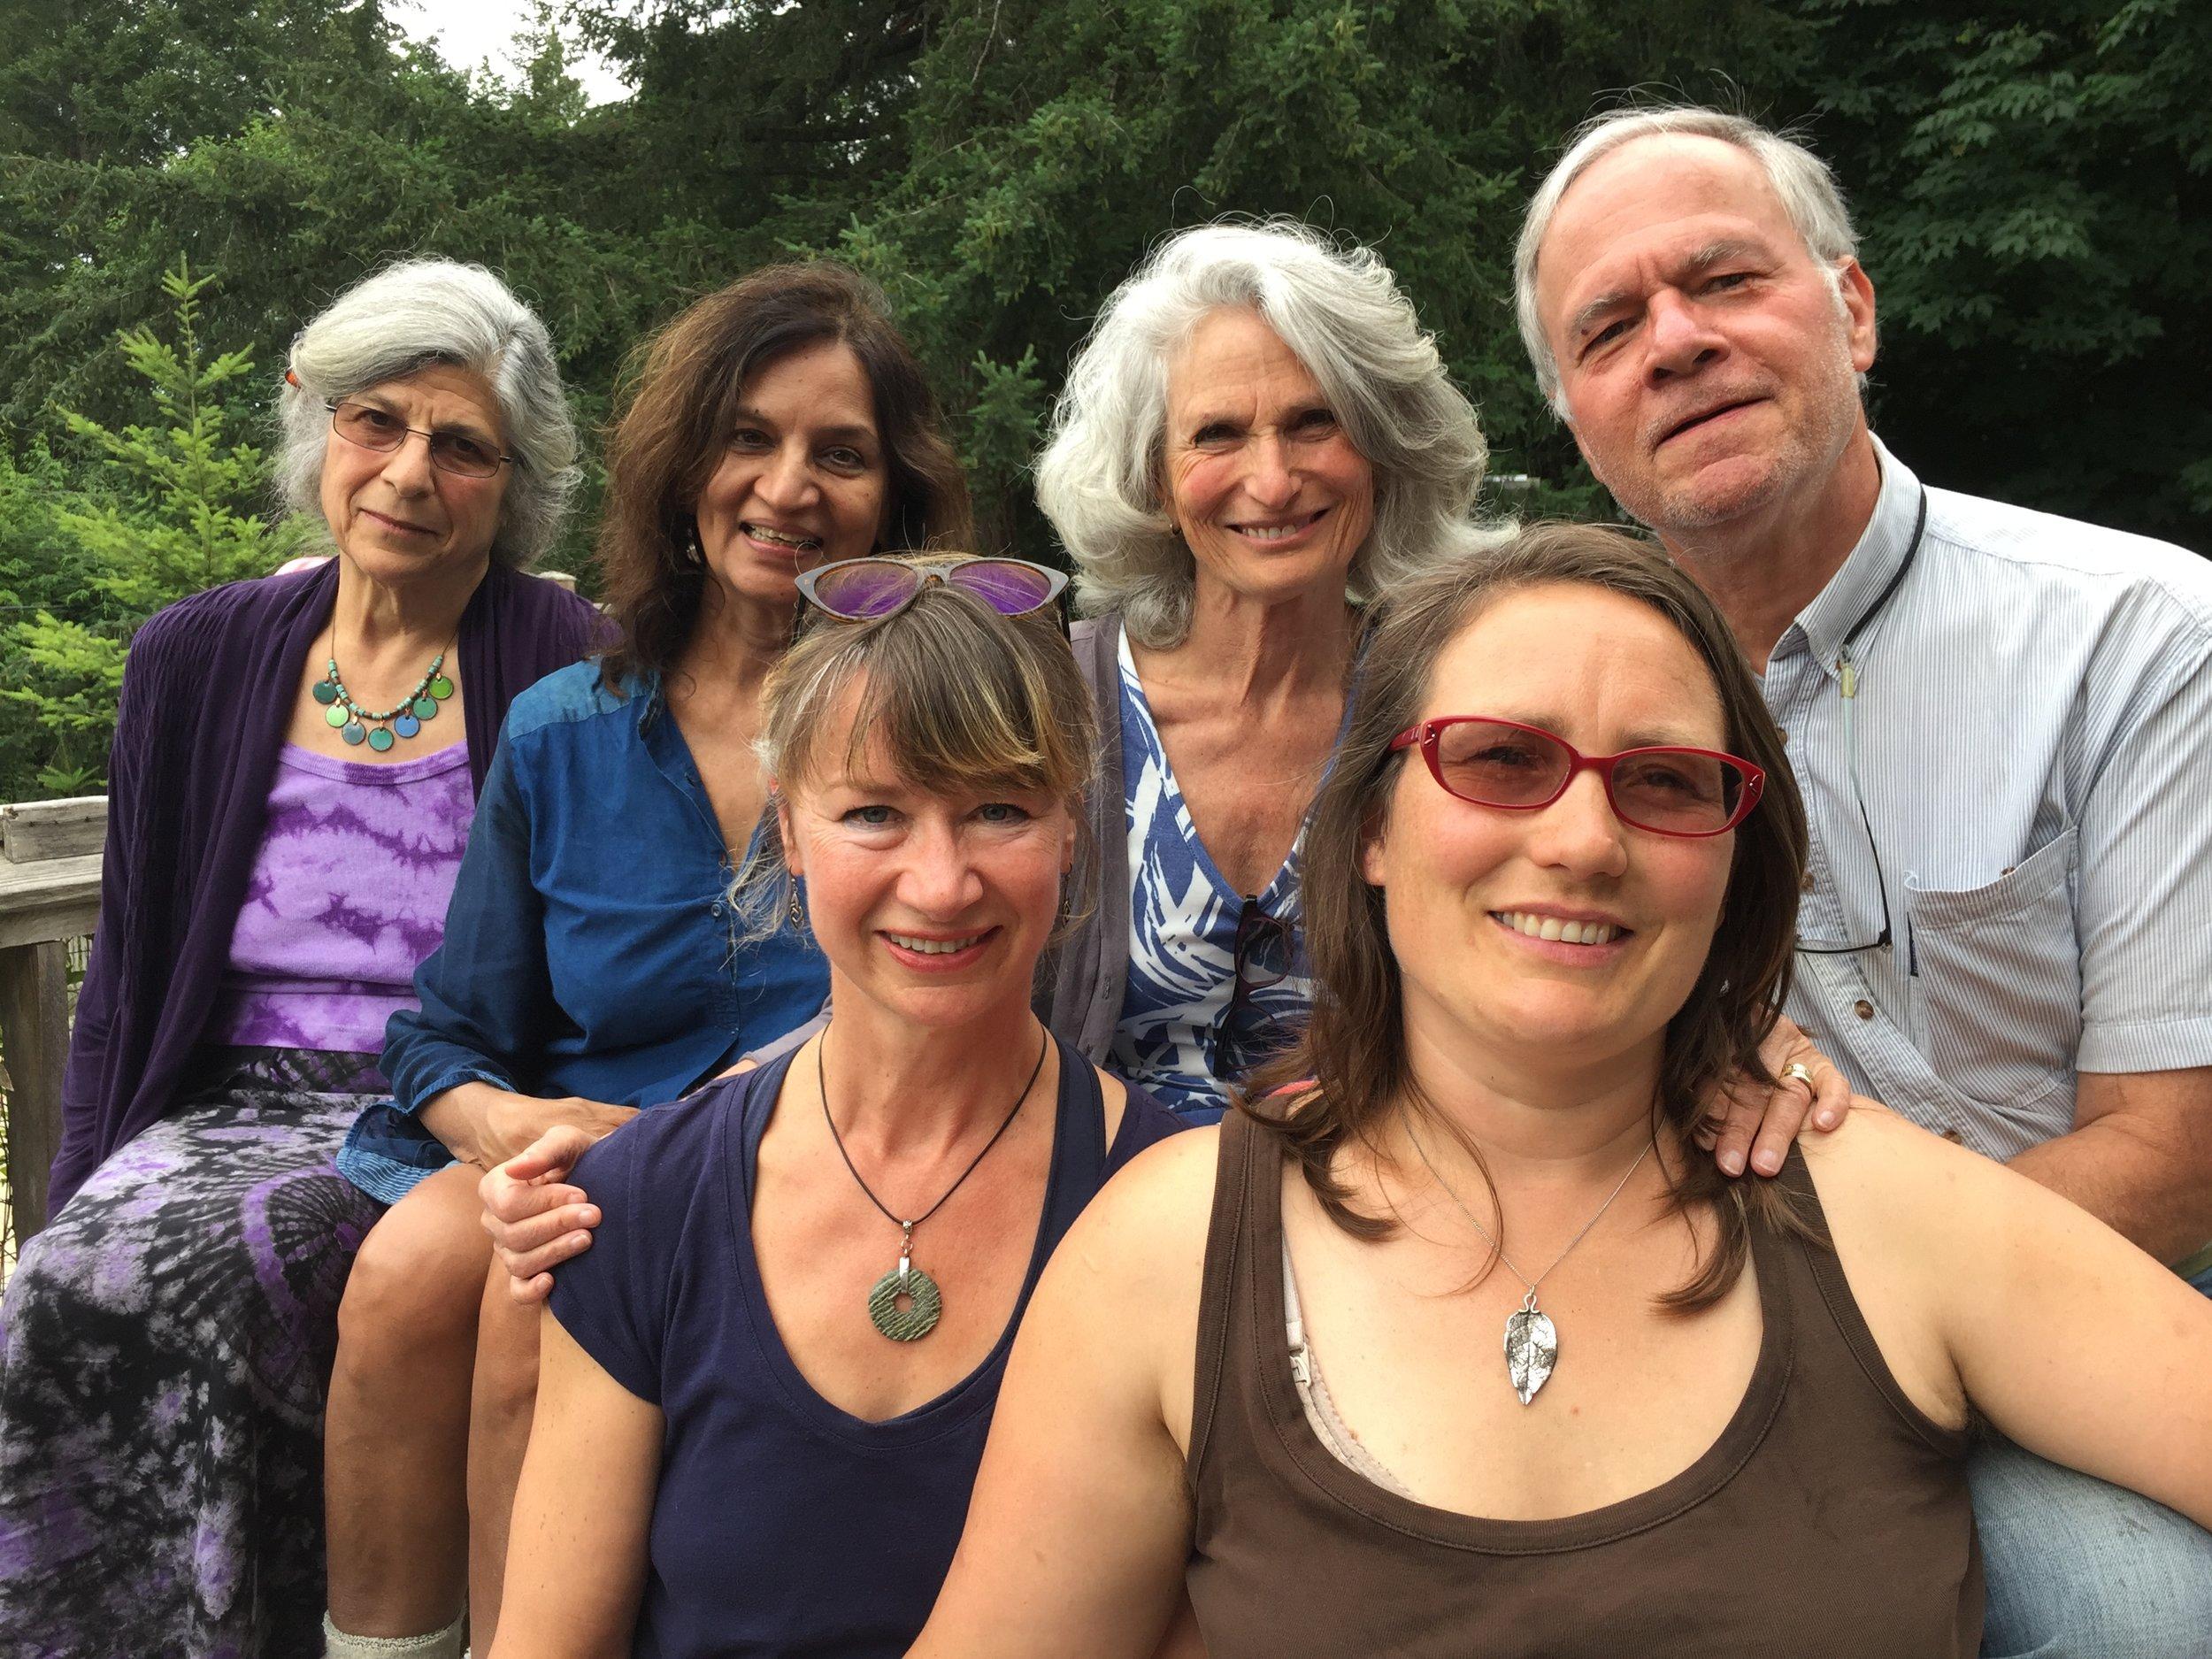 Photo left to right: Elizabeth Anderson, Deepa Narayan, Priya Huffman, David Rousseau, Sandra Wood and me